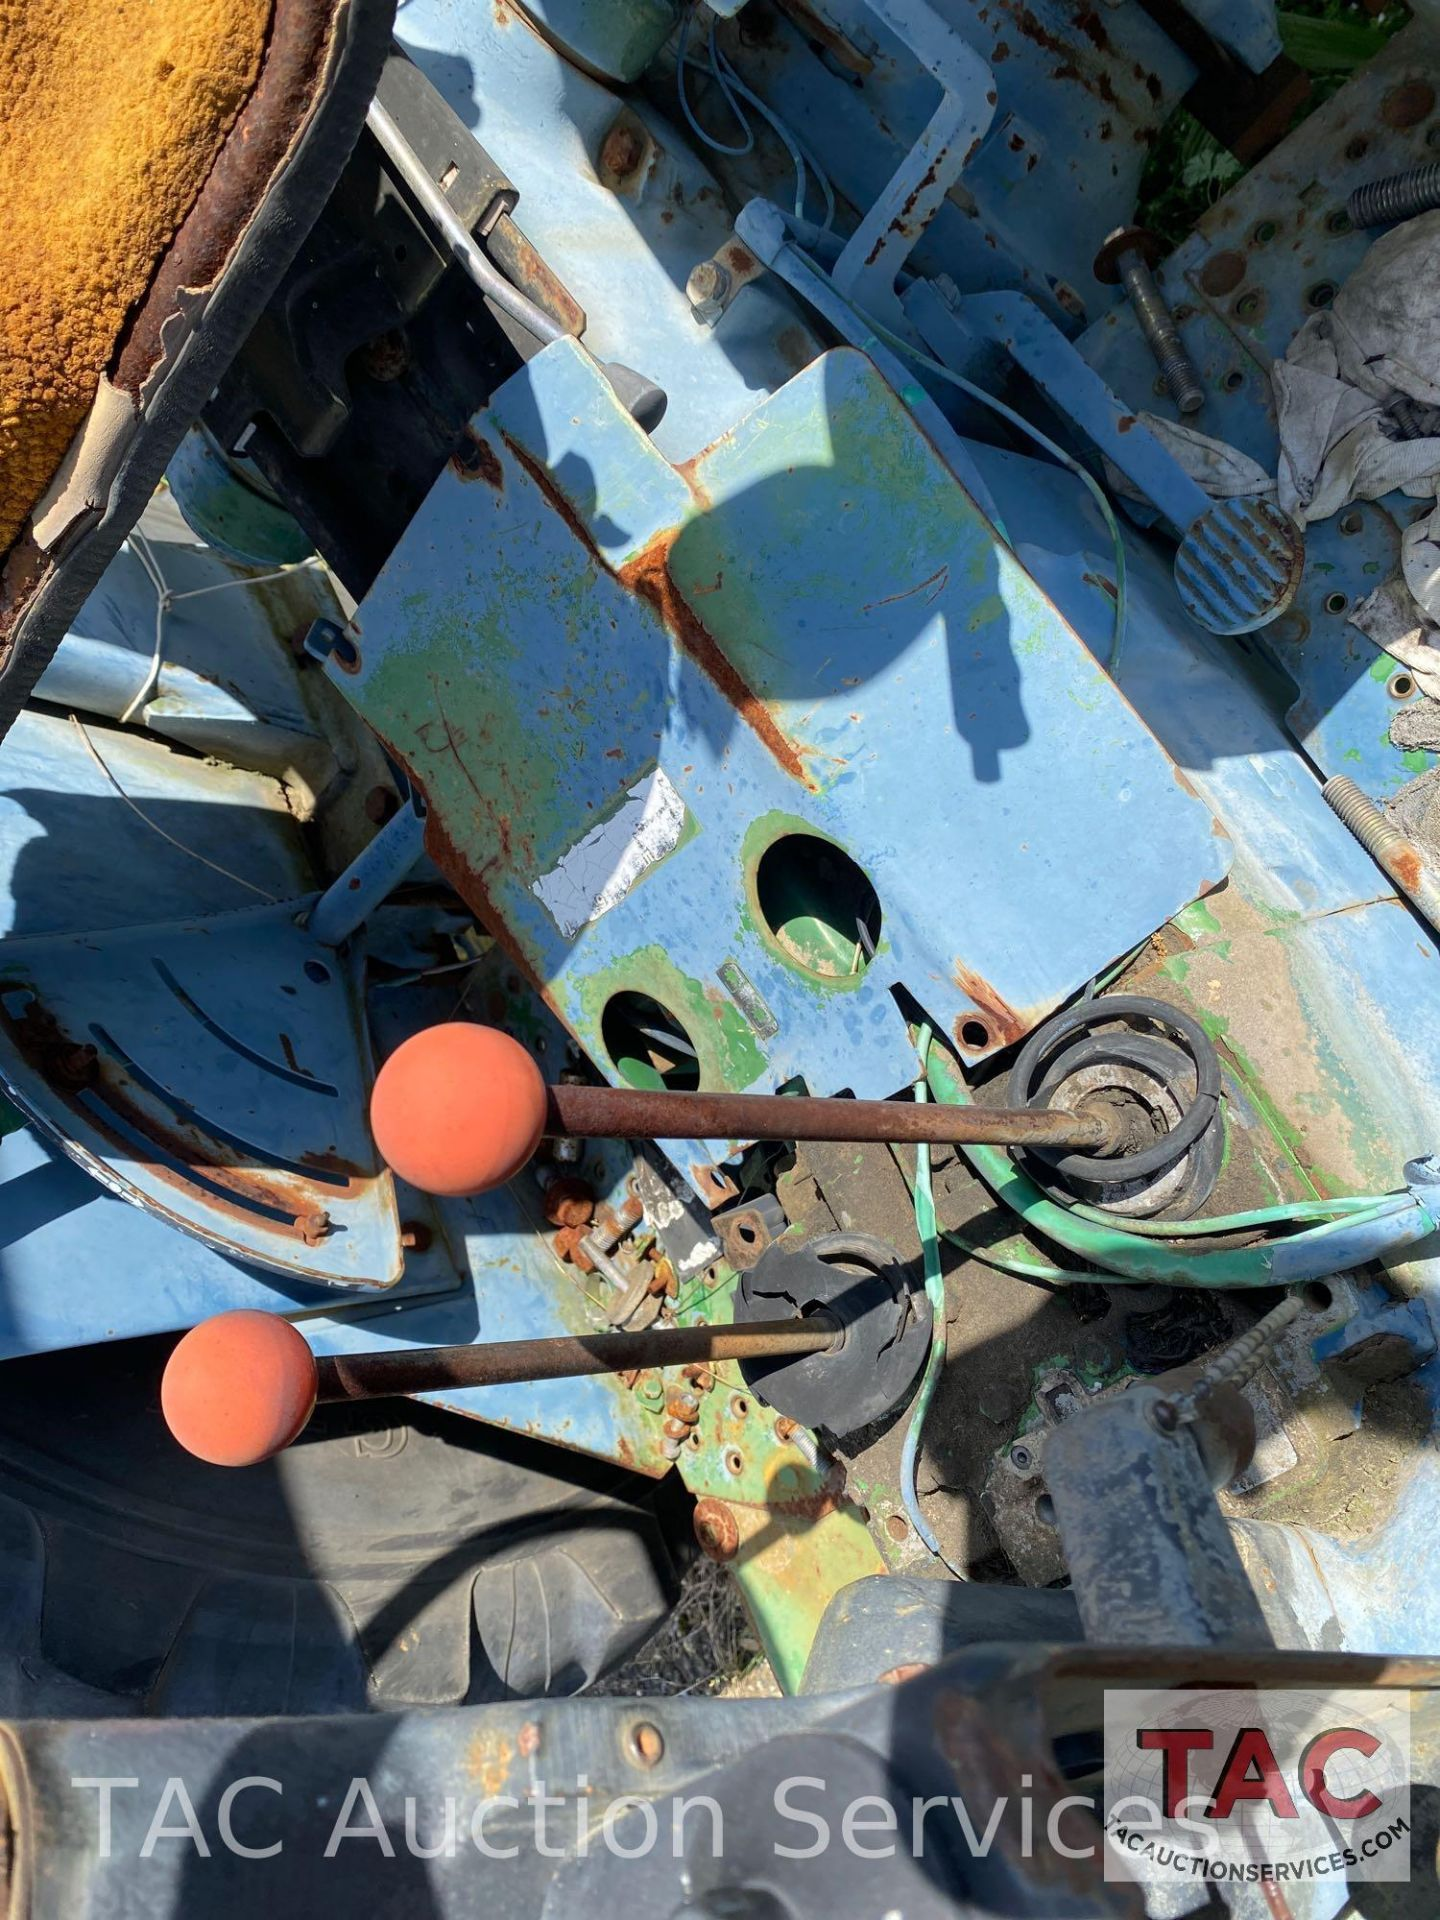 John Deere 2150 Farm Tractor - Image 15 of 34